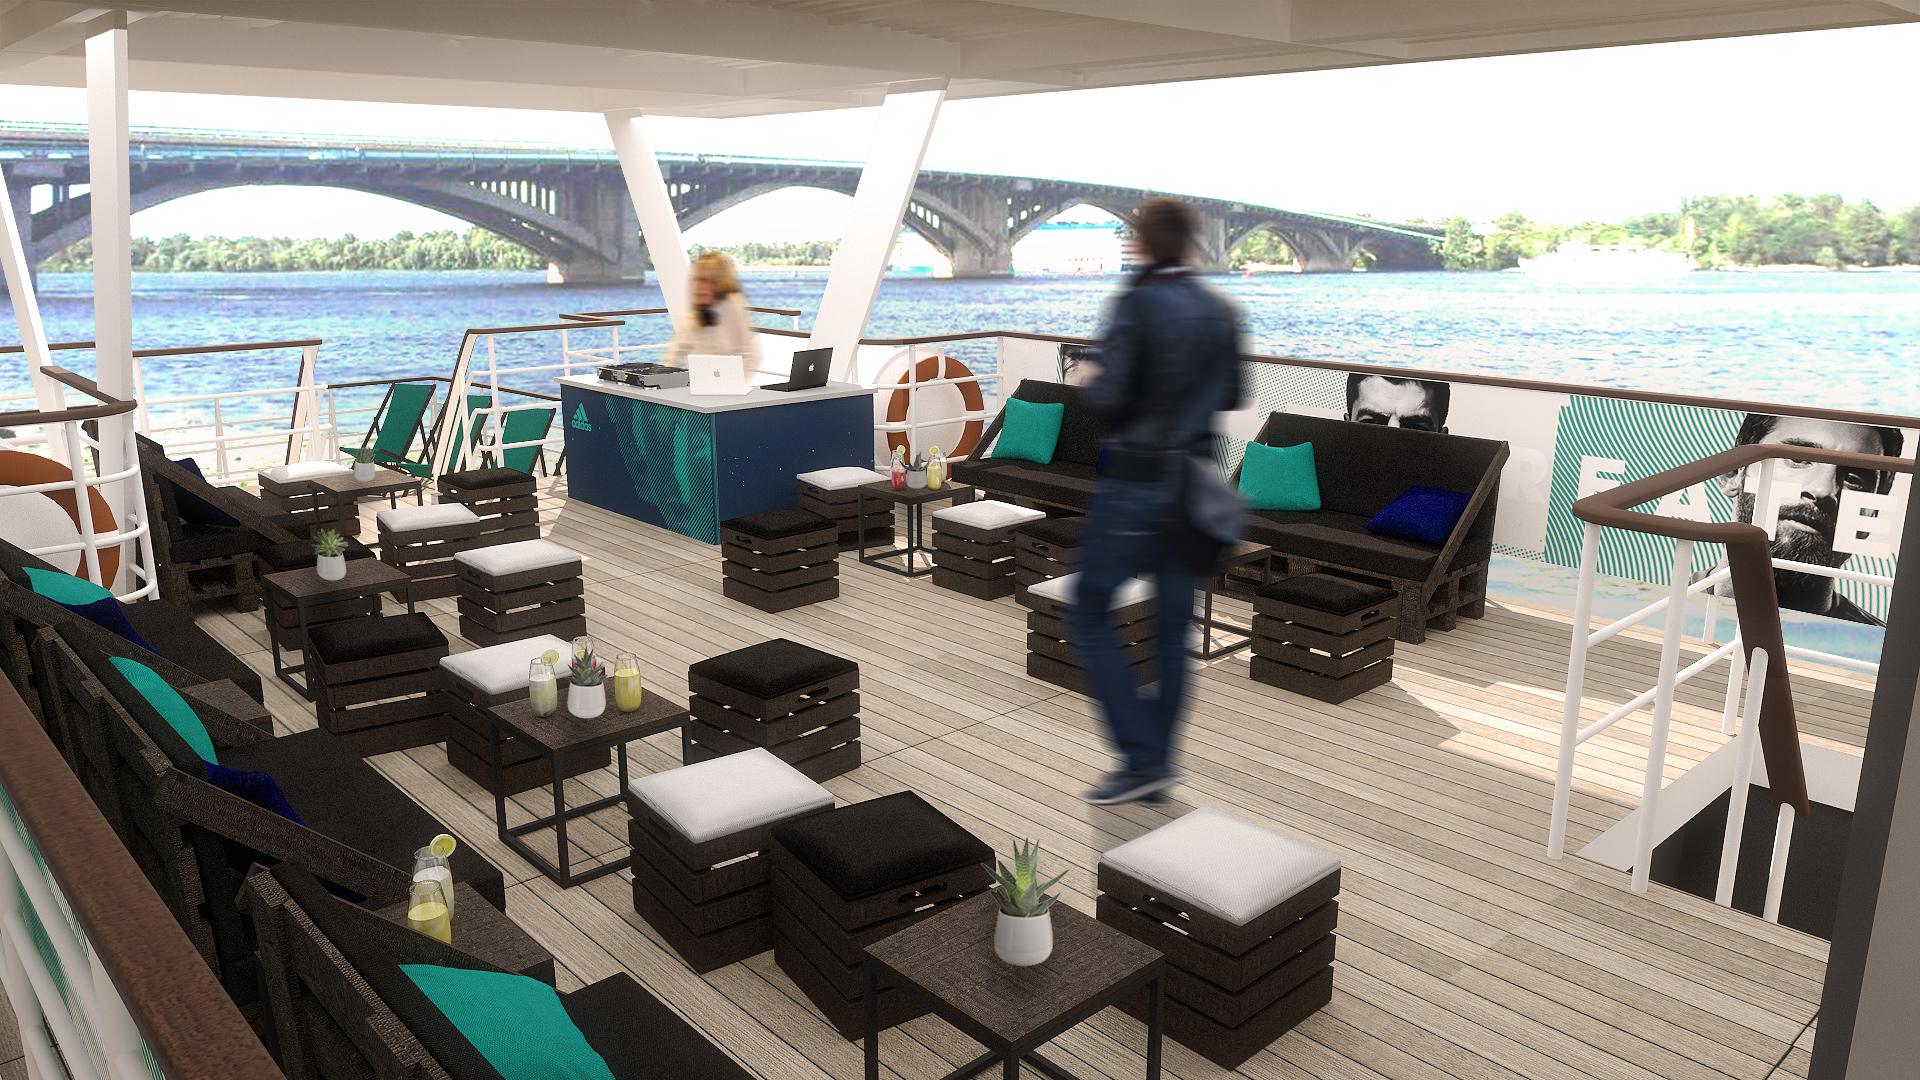 ADIDAS_UCL_Boat_01_Top Deck_People.jpg